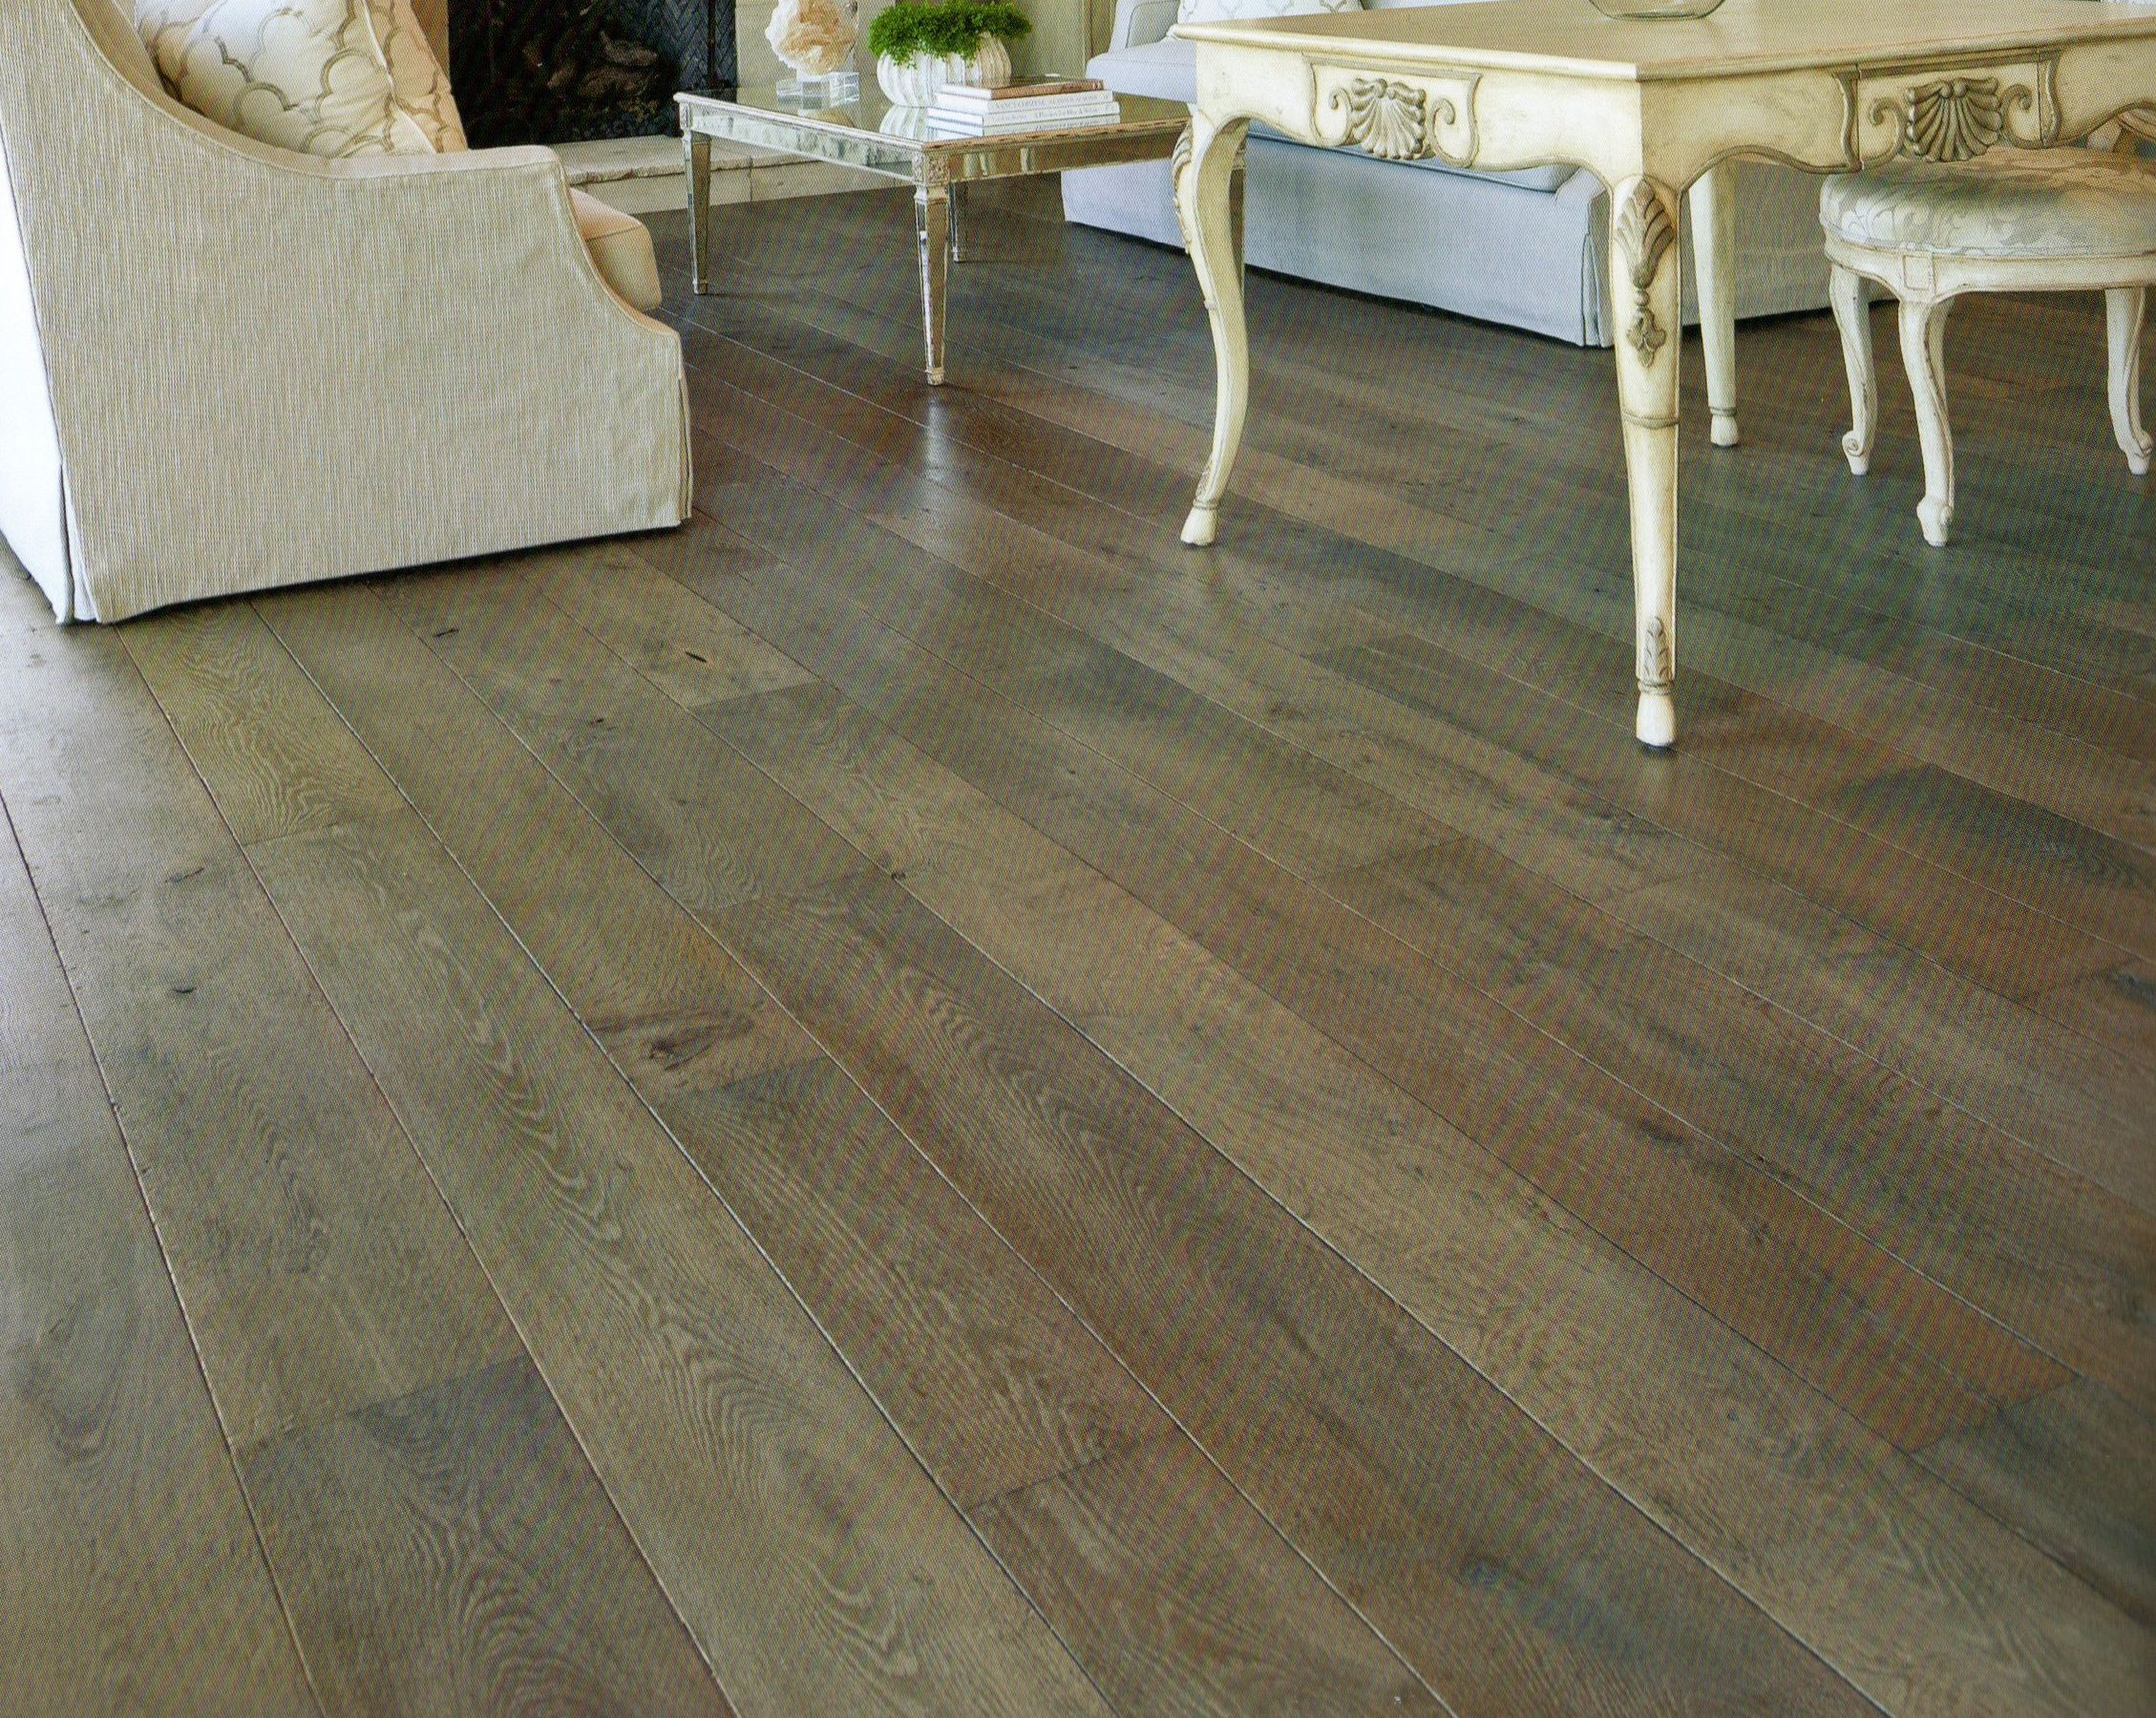 Gray Wood Floors: Grey Wood Floors